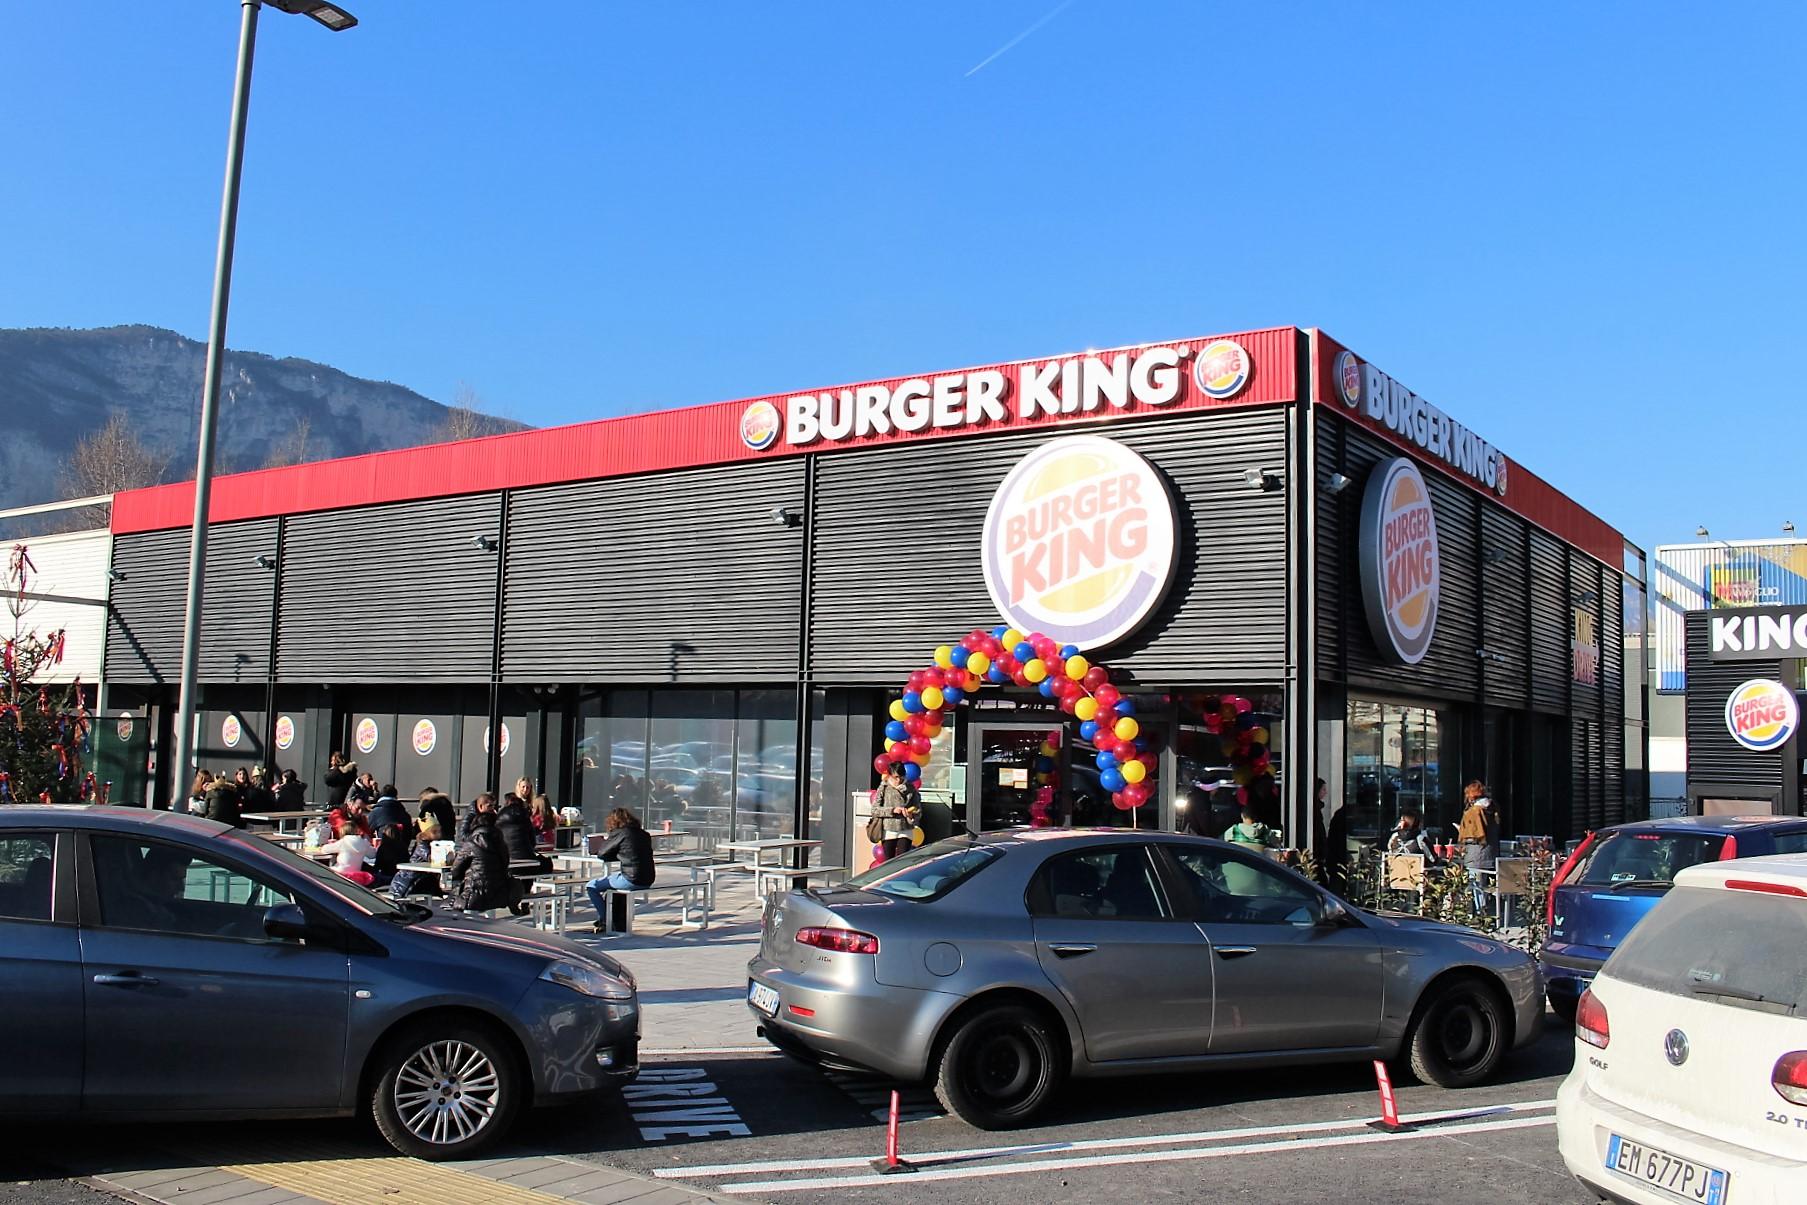 trento-burger king (23)